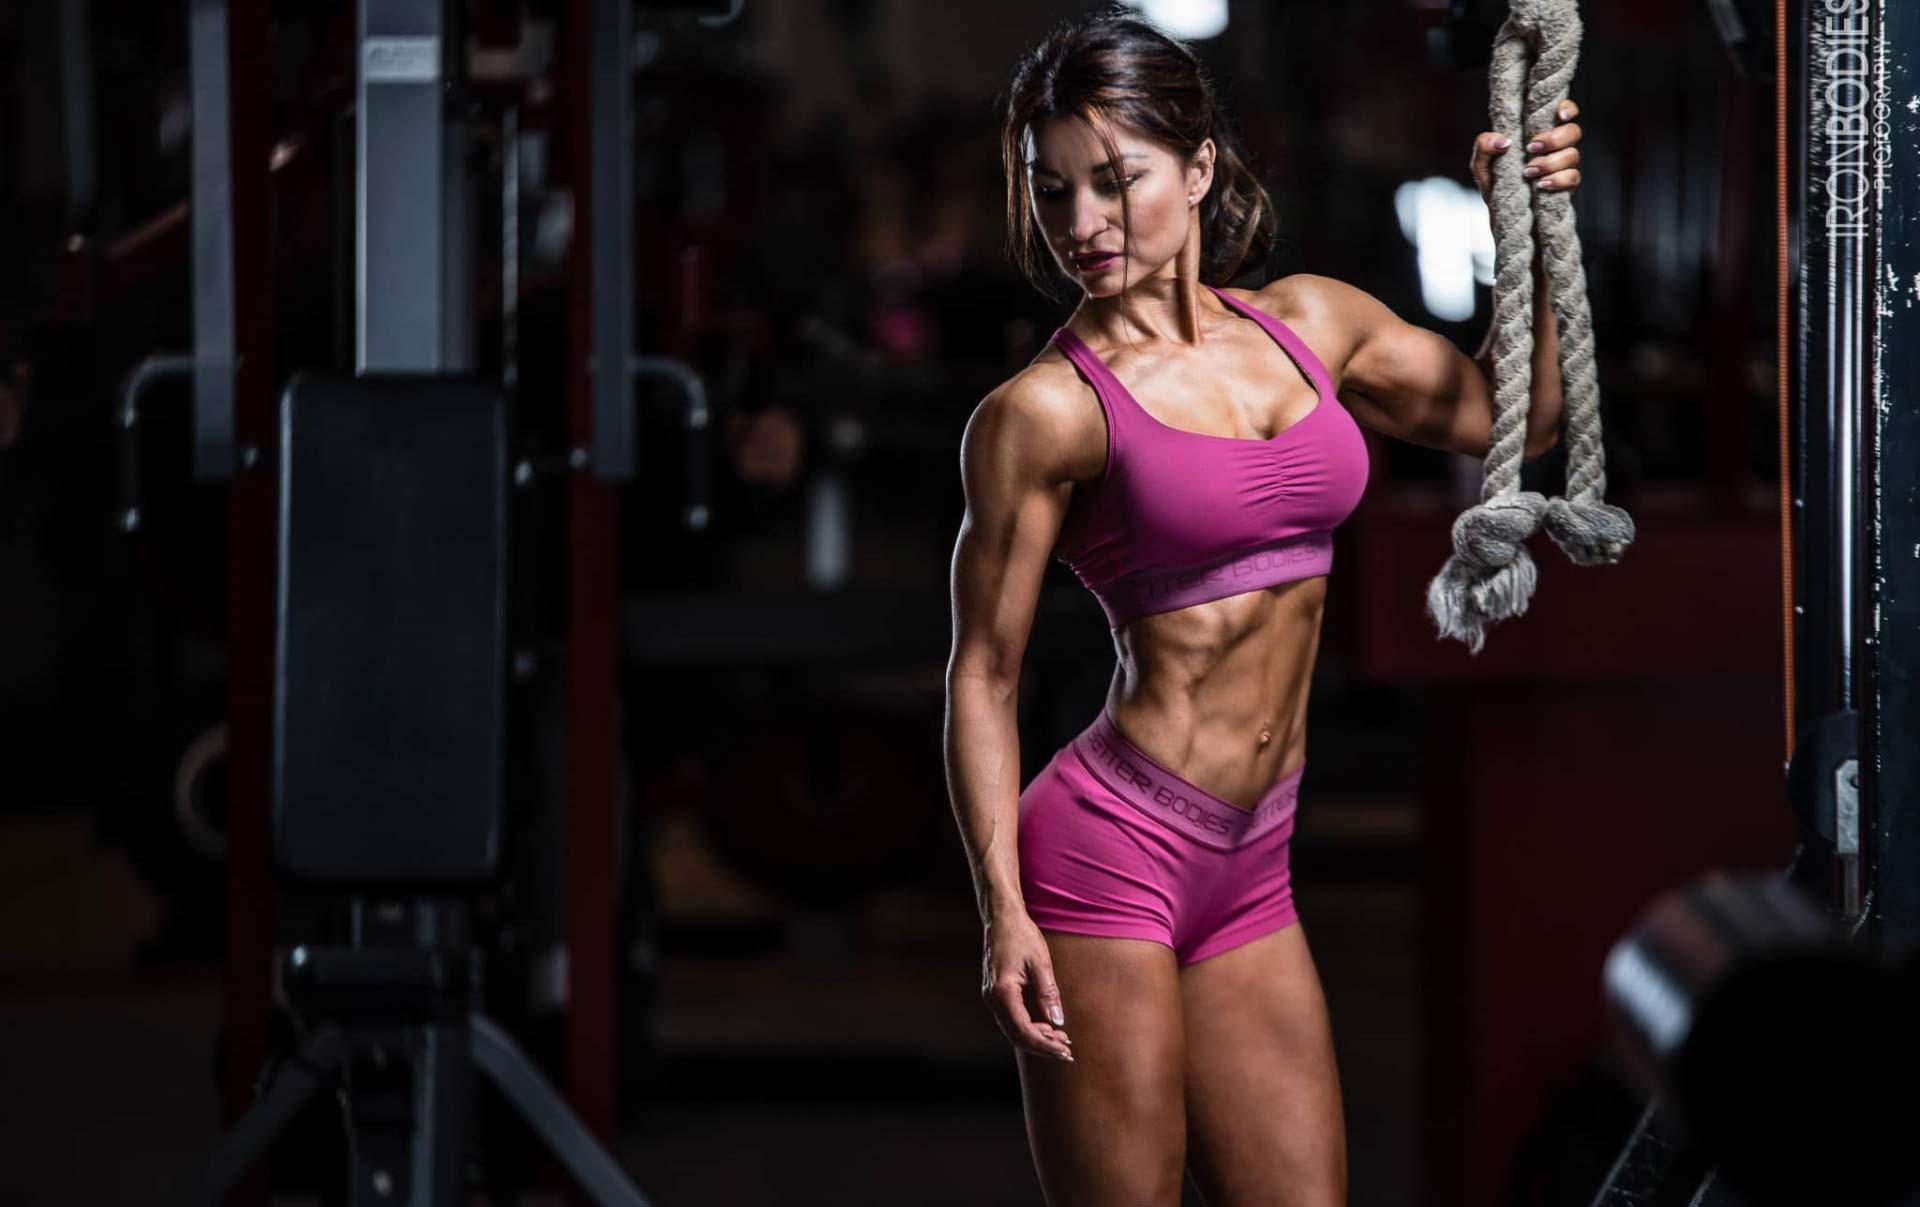 Shooting weibliches Fitnessmodel im Gym